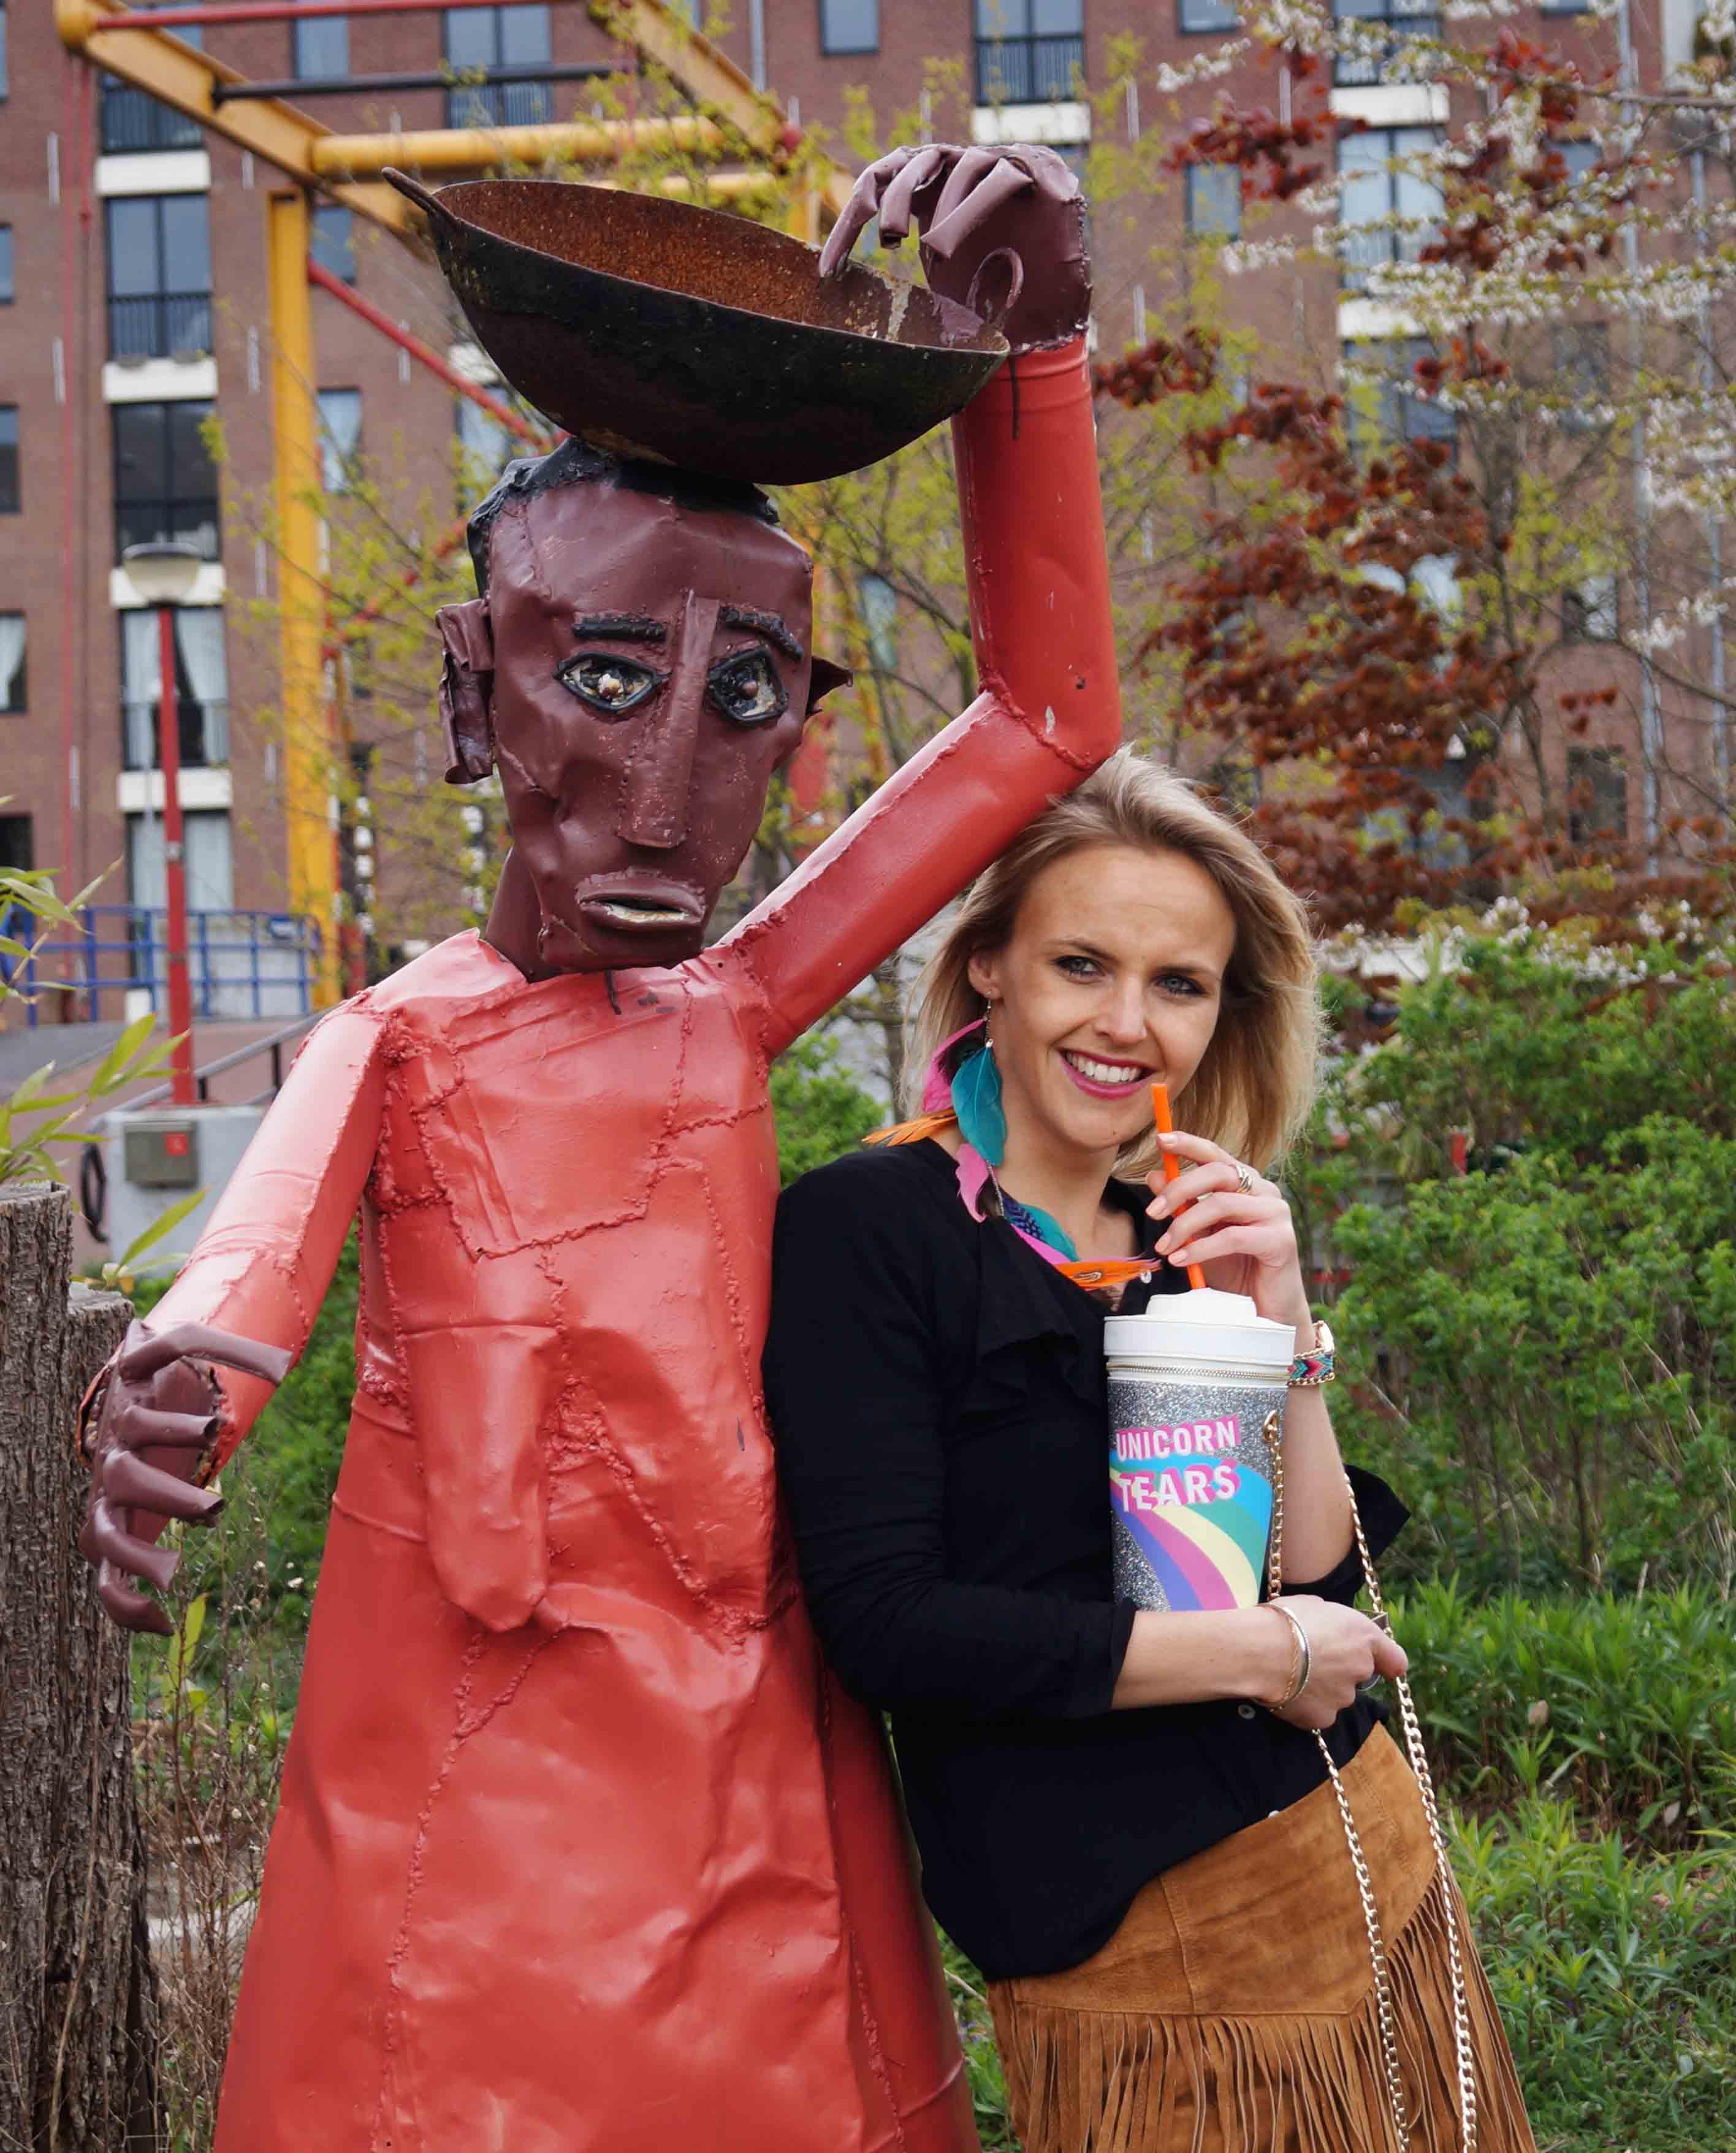 Bag at You - Fashion Blog - Festival tas - Party Bag - Milkshake - Unicorn schoudertas